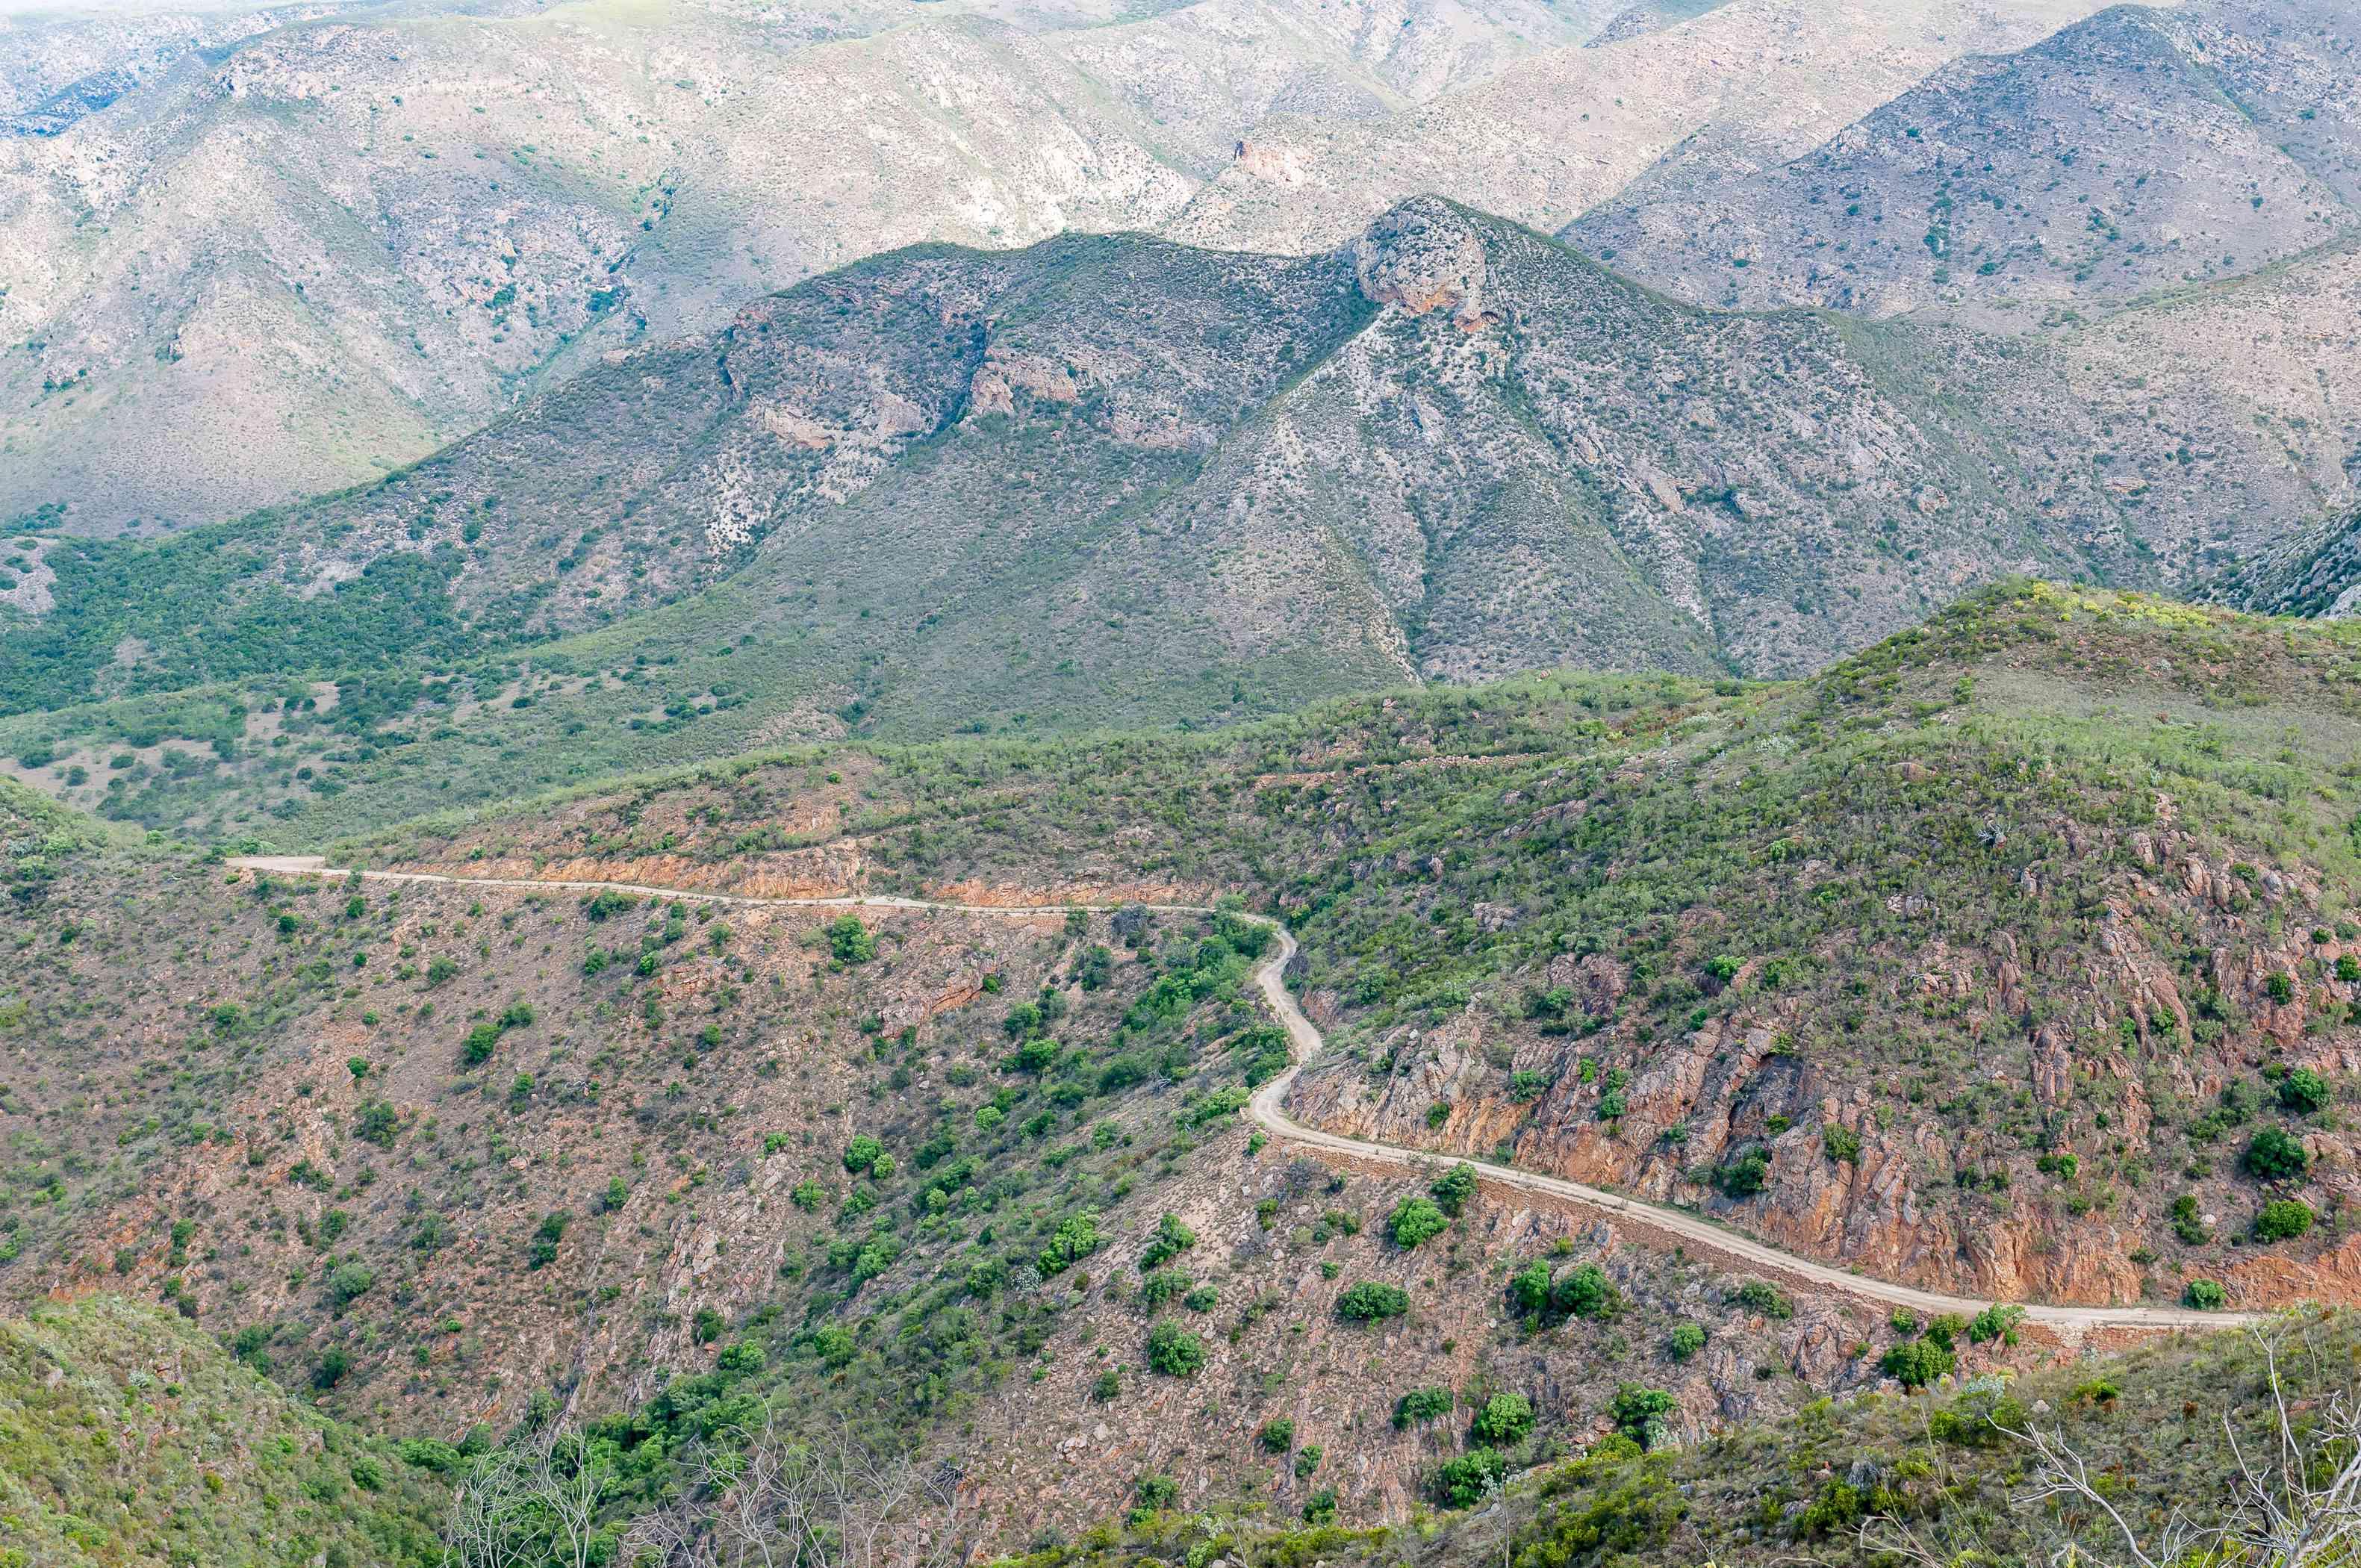 Holgat Pass, Baviaanskloof Nature Reserve